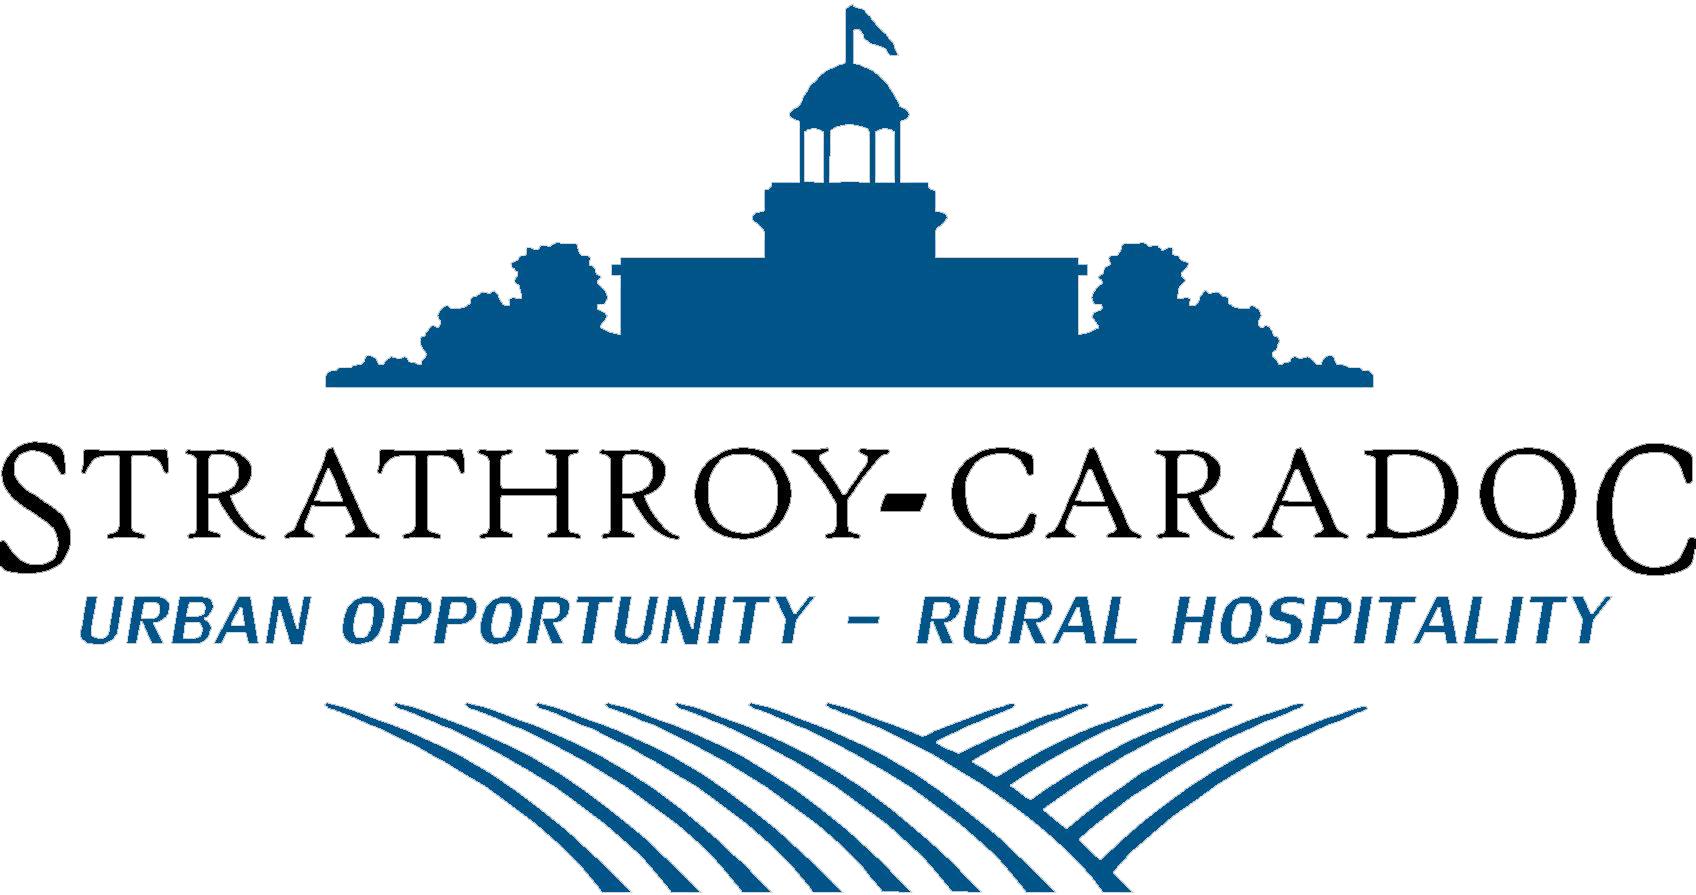 Municipality of Strathroy-Caradoc